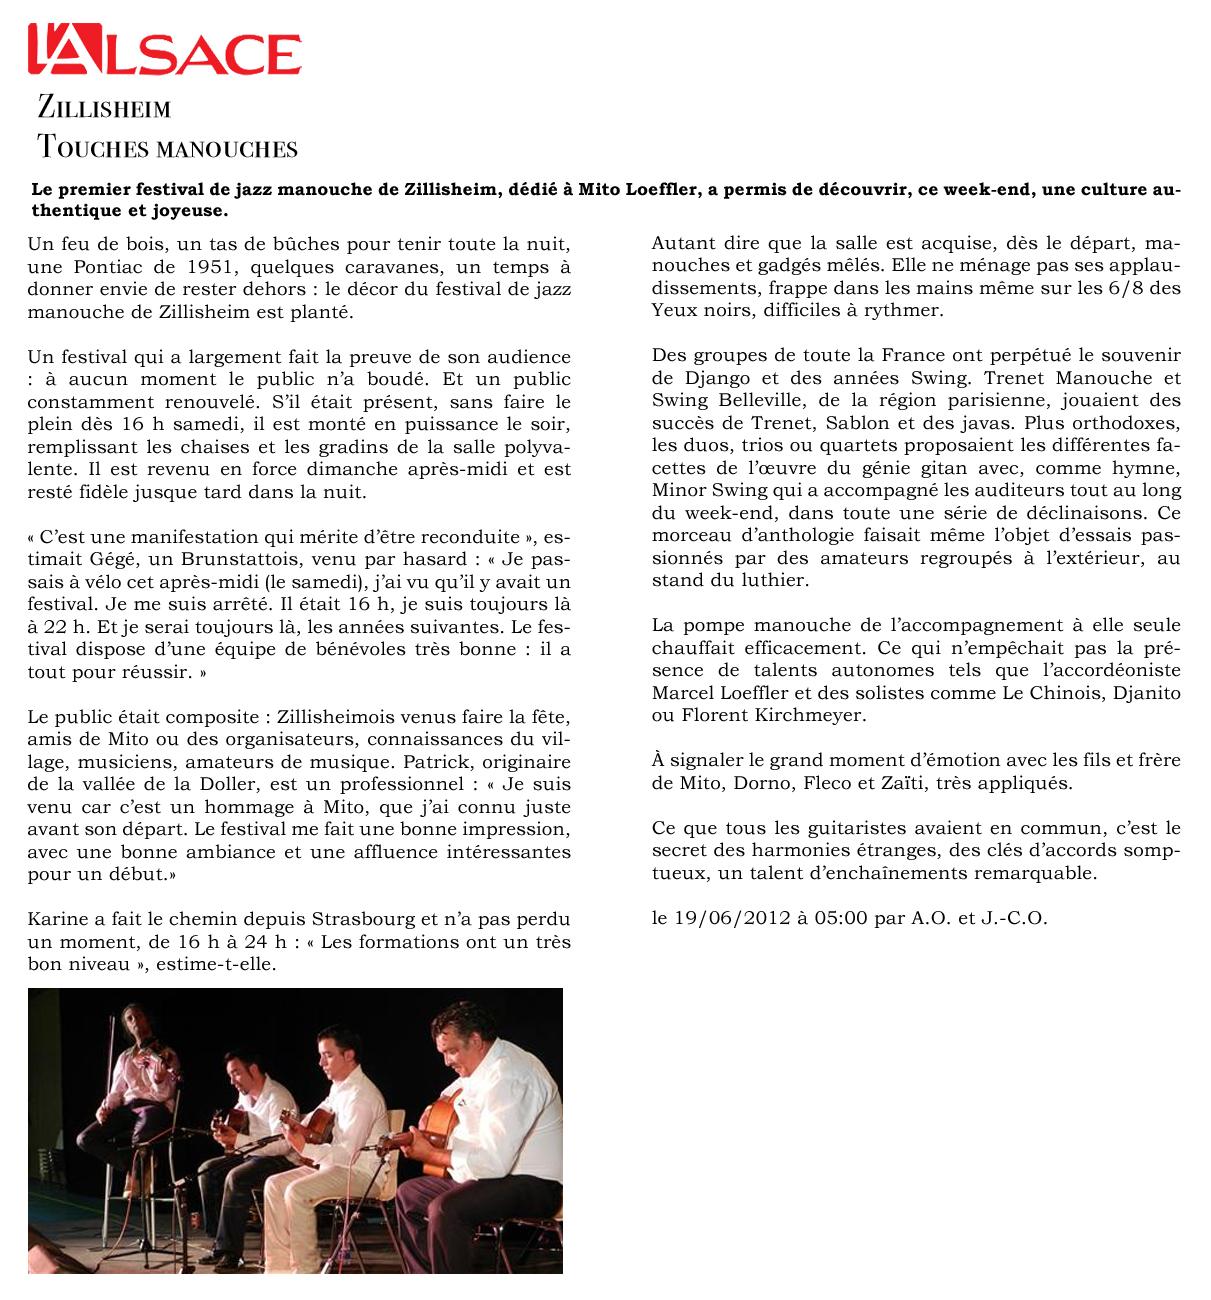 Alsace-19-06-12